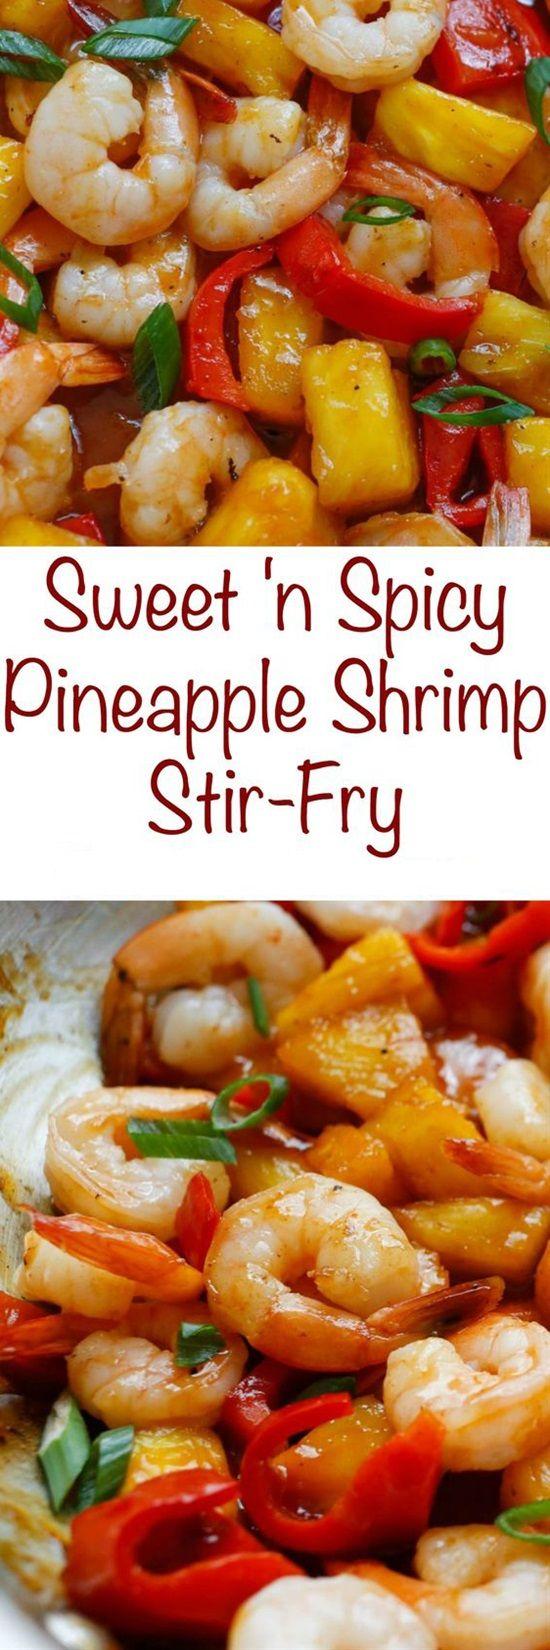 Crispy Fried Shrimp Recipe - The Seasoned Mom